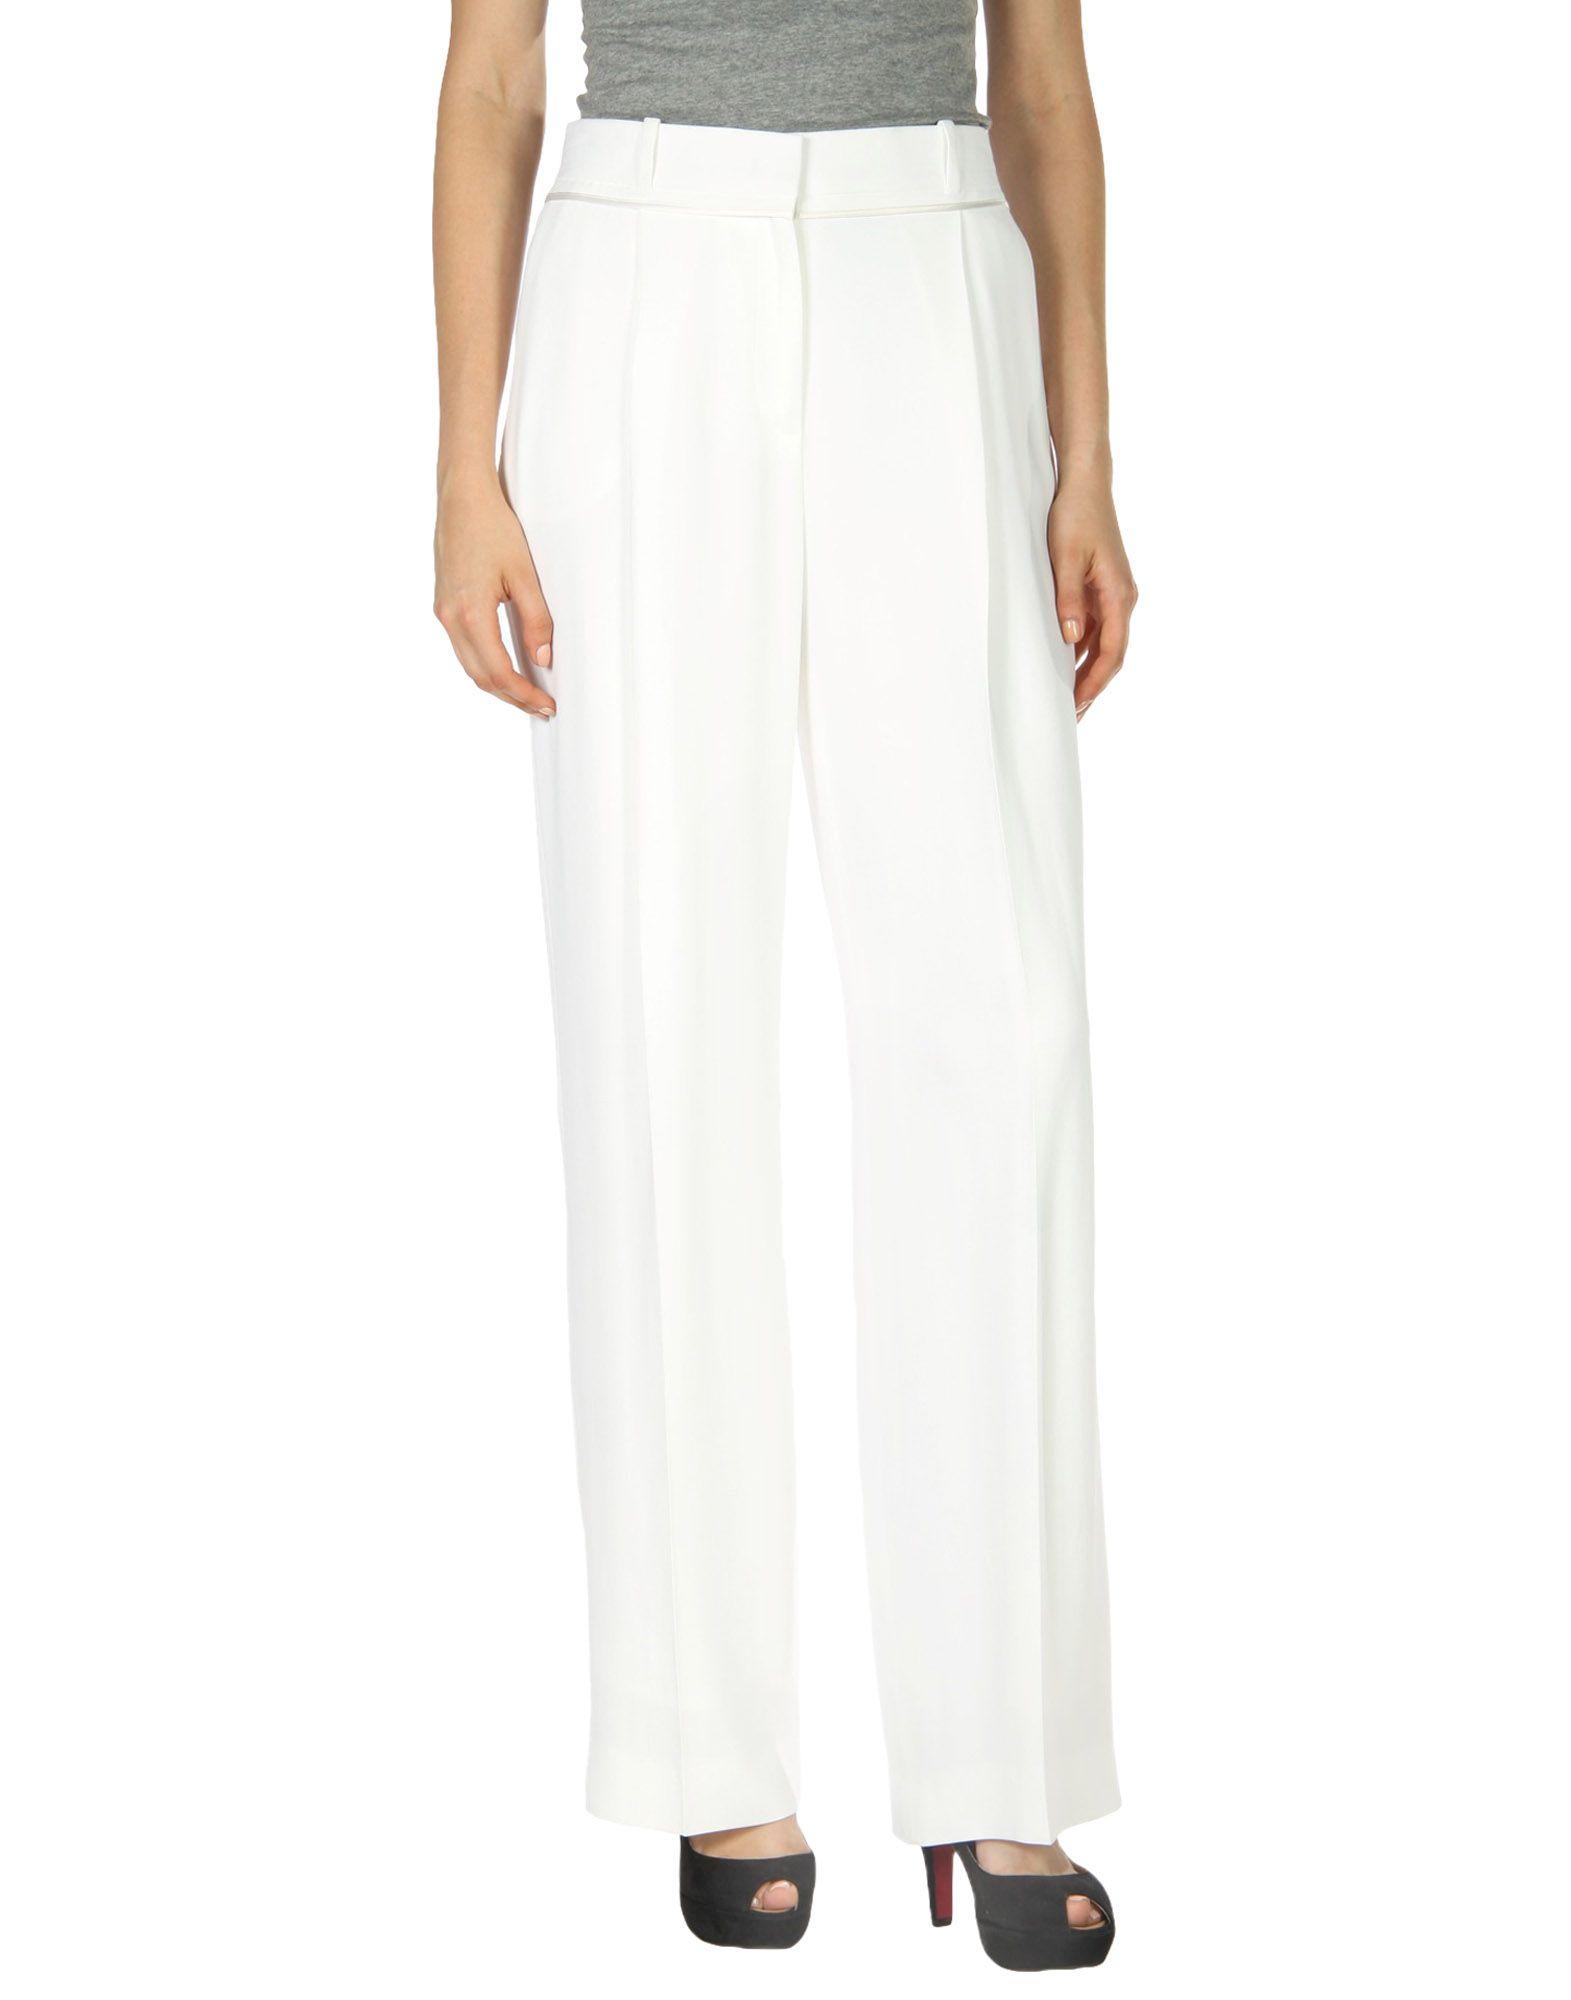 Pantalone Givenchy Donna - Acquista online su lNbXy6M